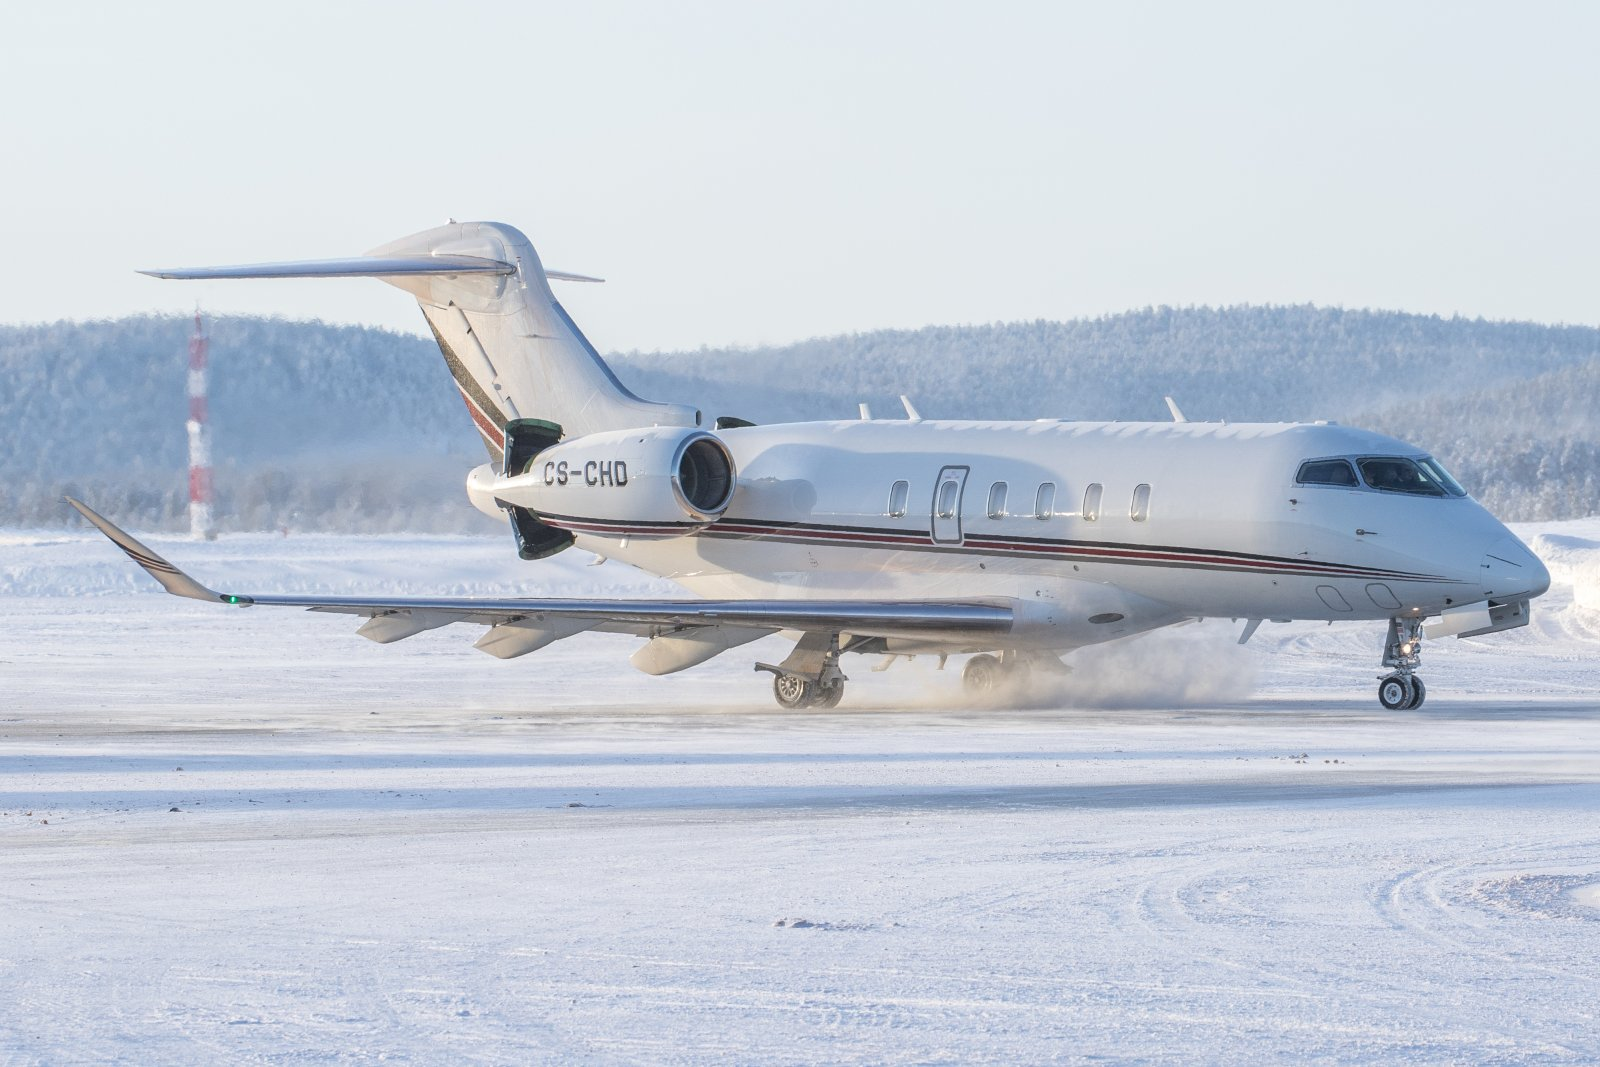 CS-CHD. Bombardier Challenger 350.